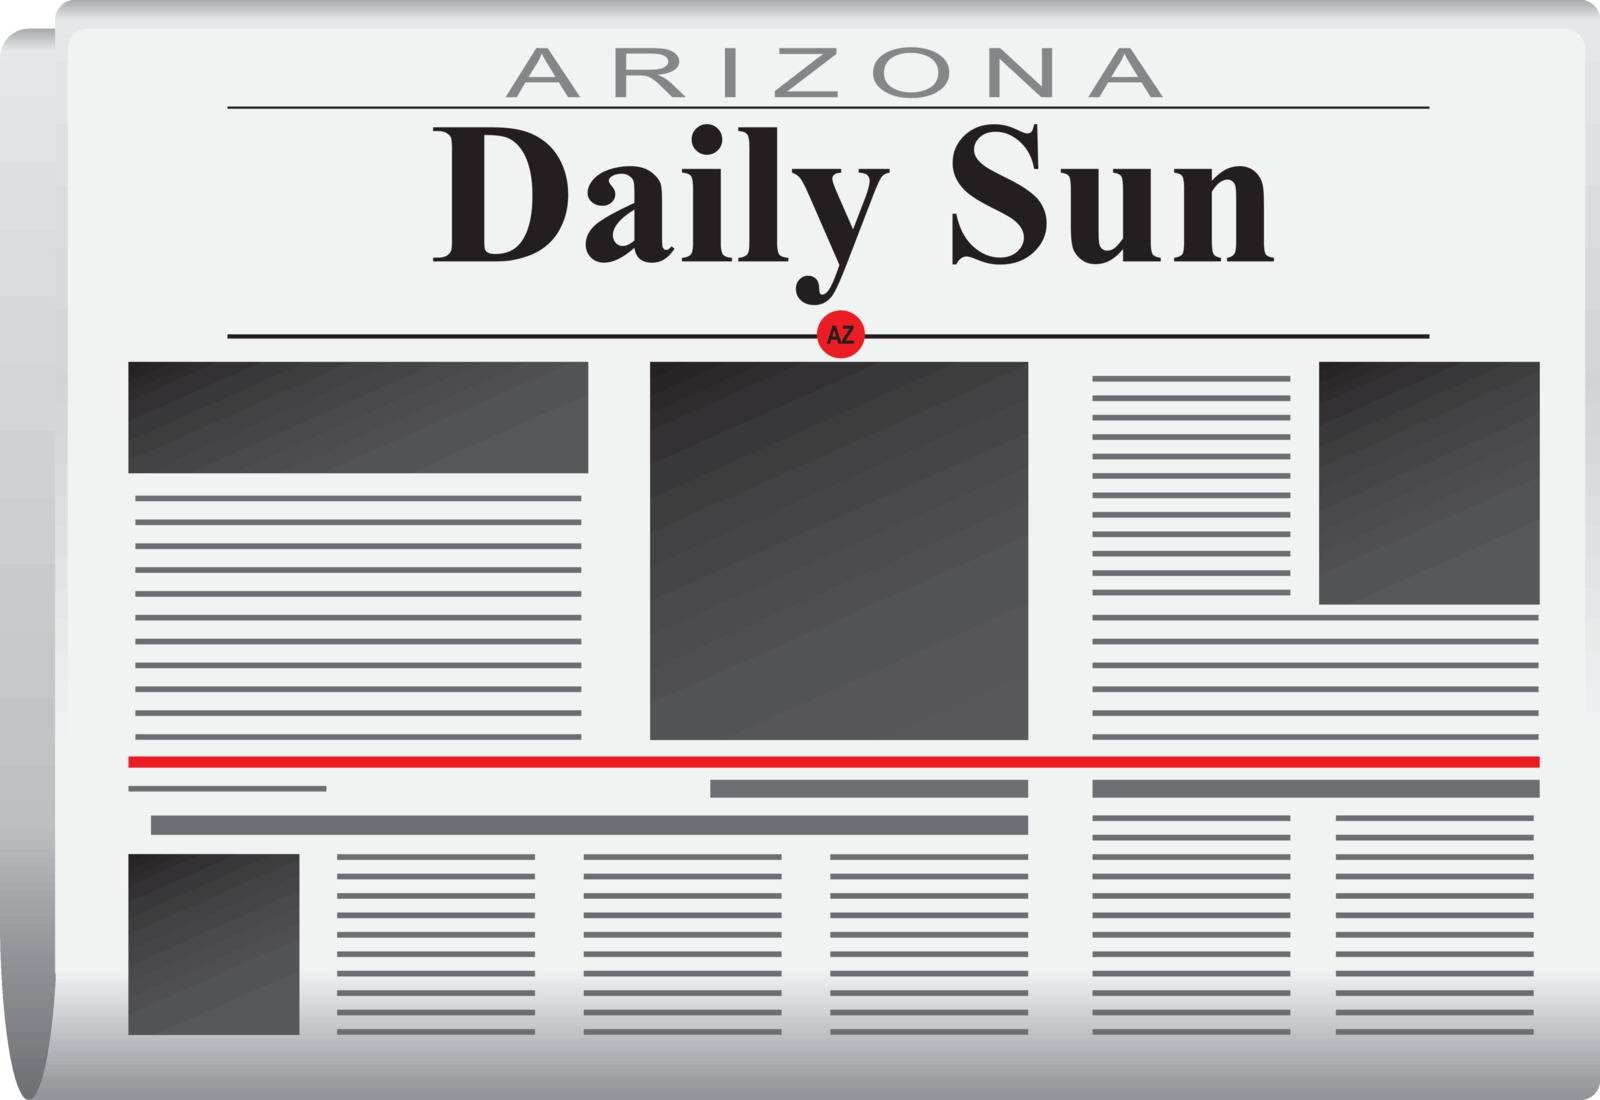 Newspaper arizona daily sun by VIPDesignUSA